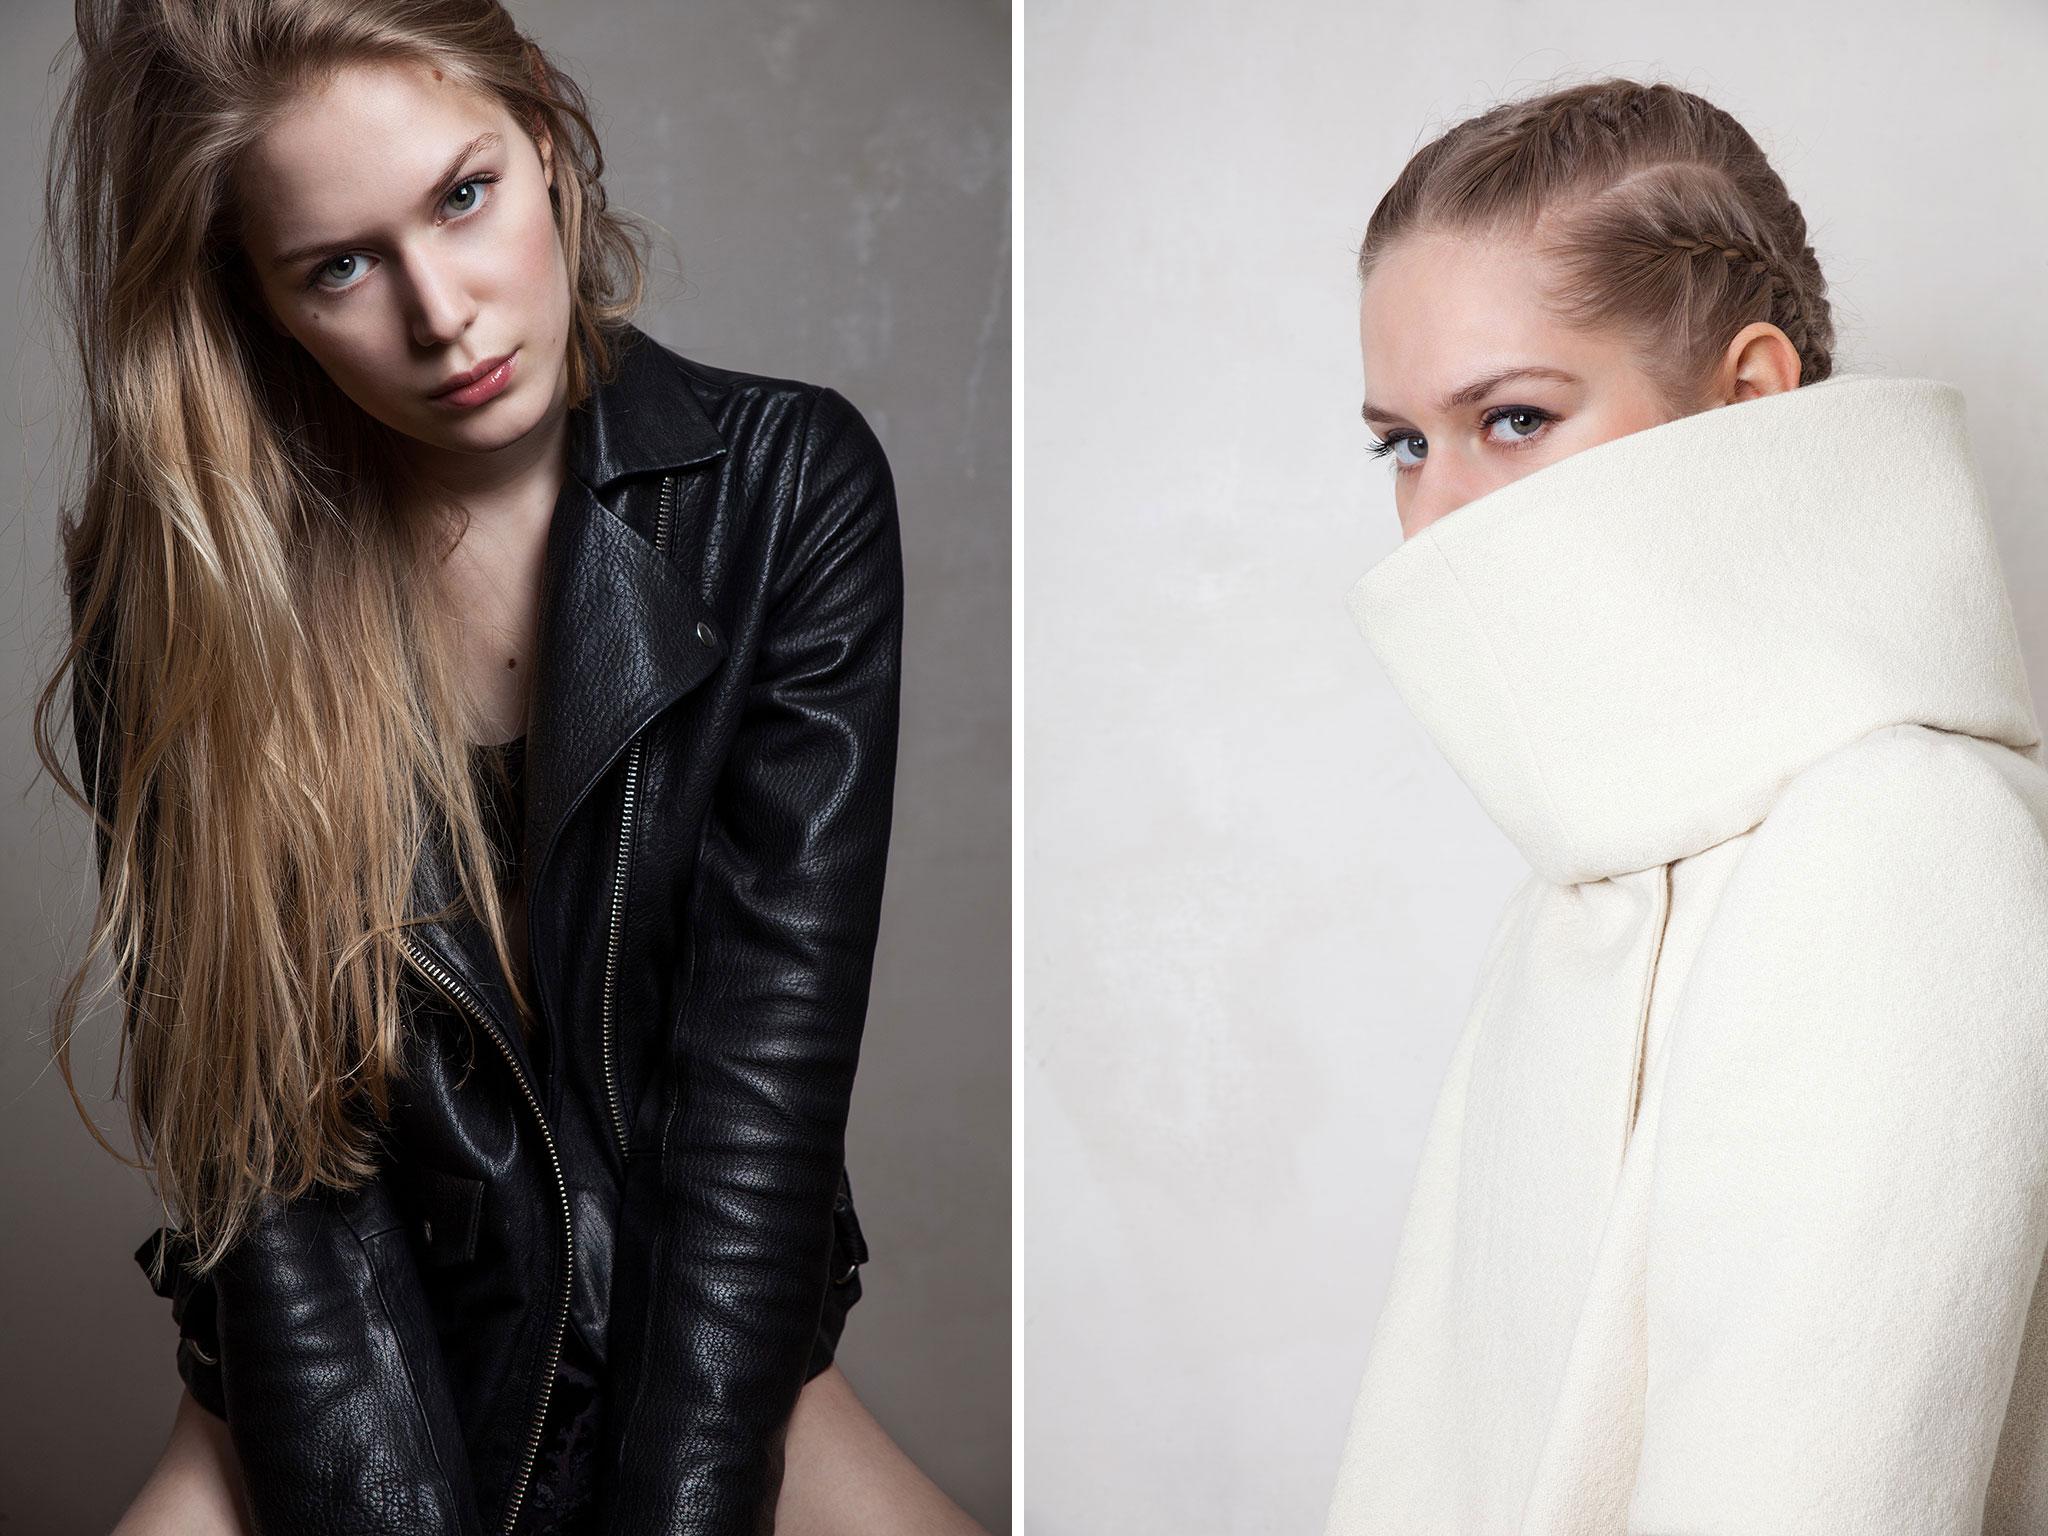 Marusja Archipov c Anna Wasilewski Bachelor Nicole Albrecht